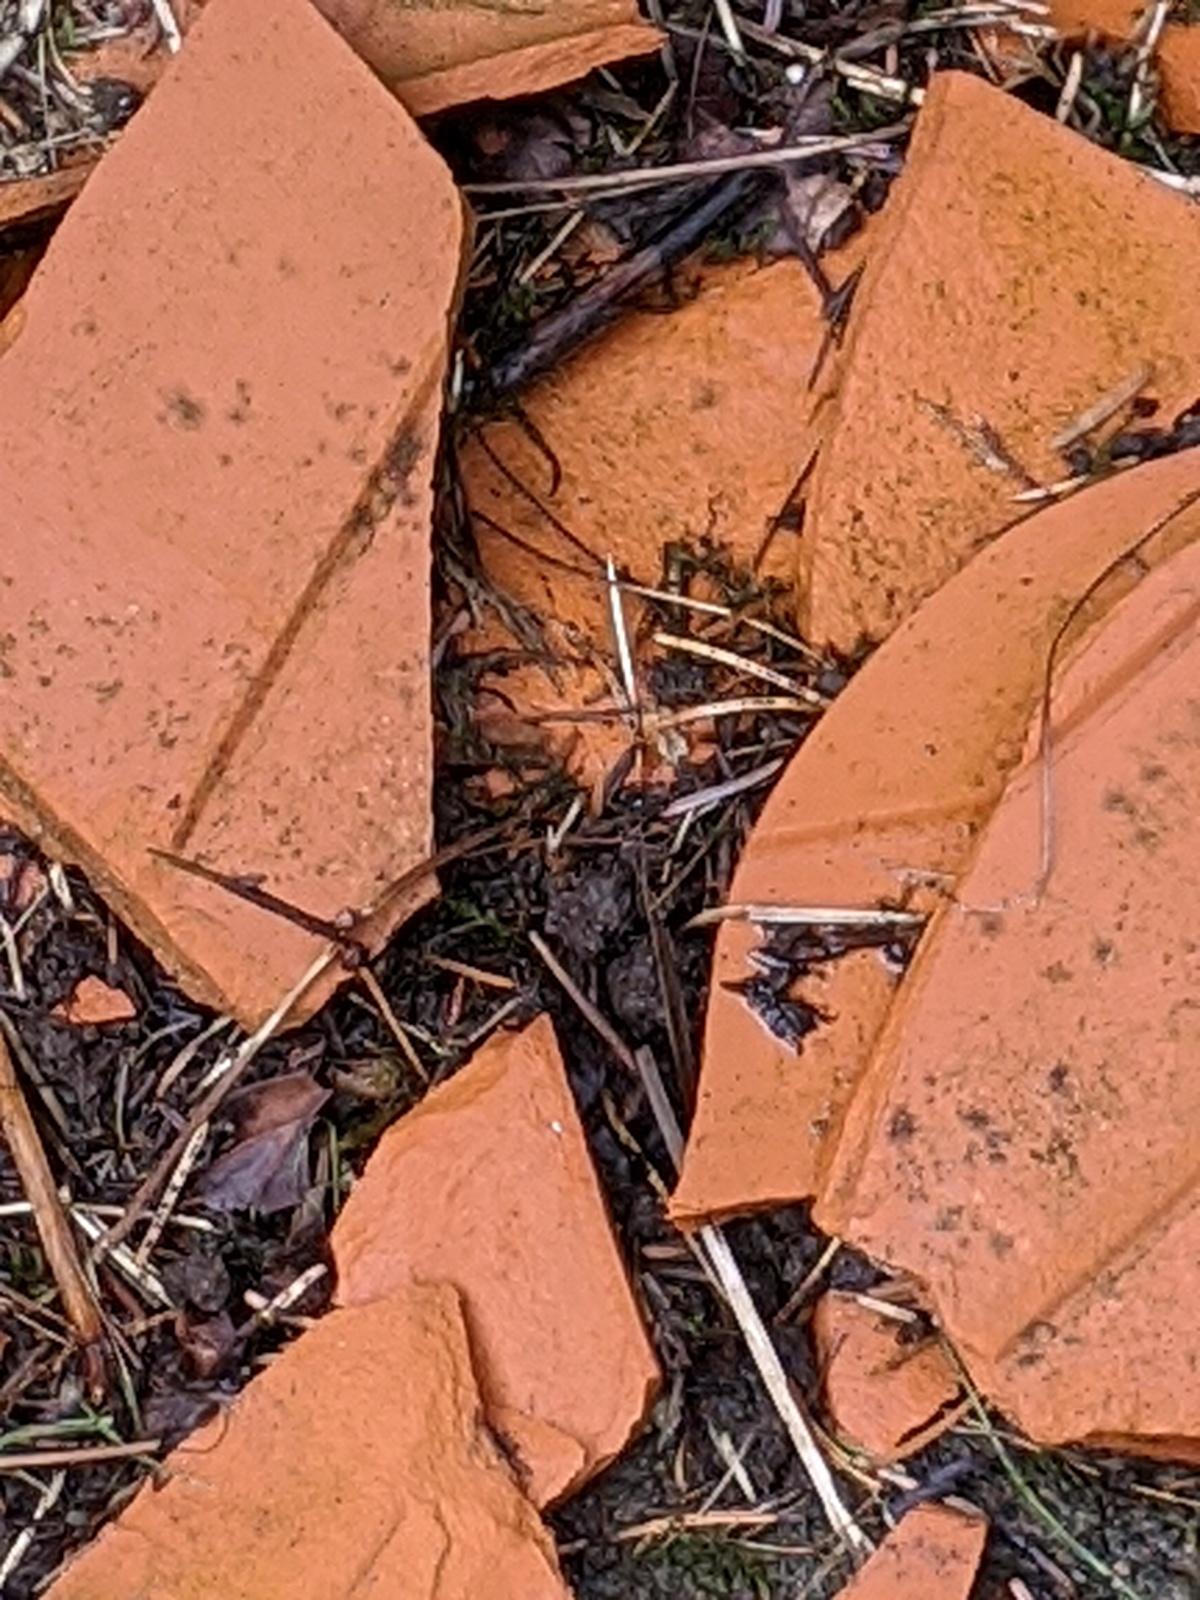 A broken plant pot in the dirt